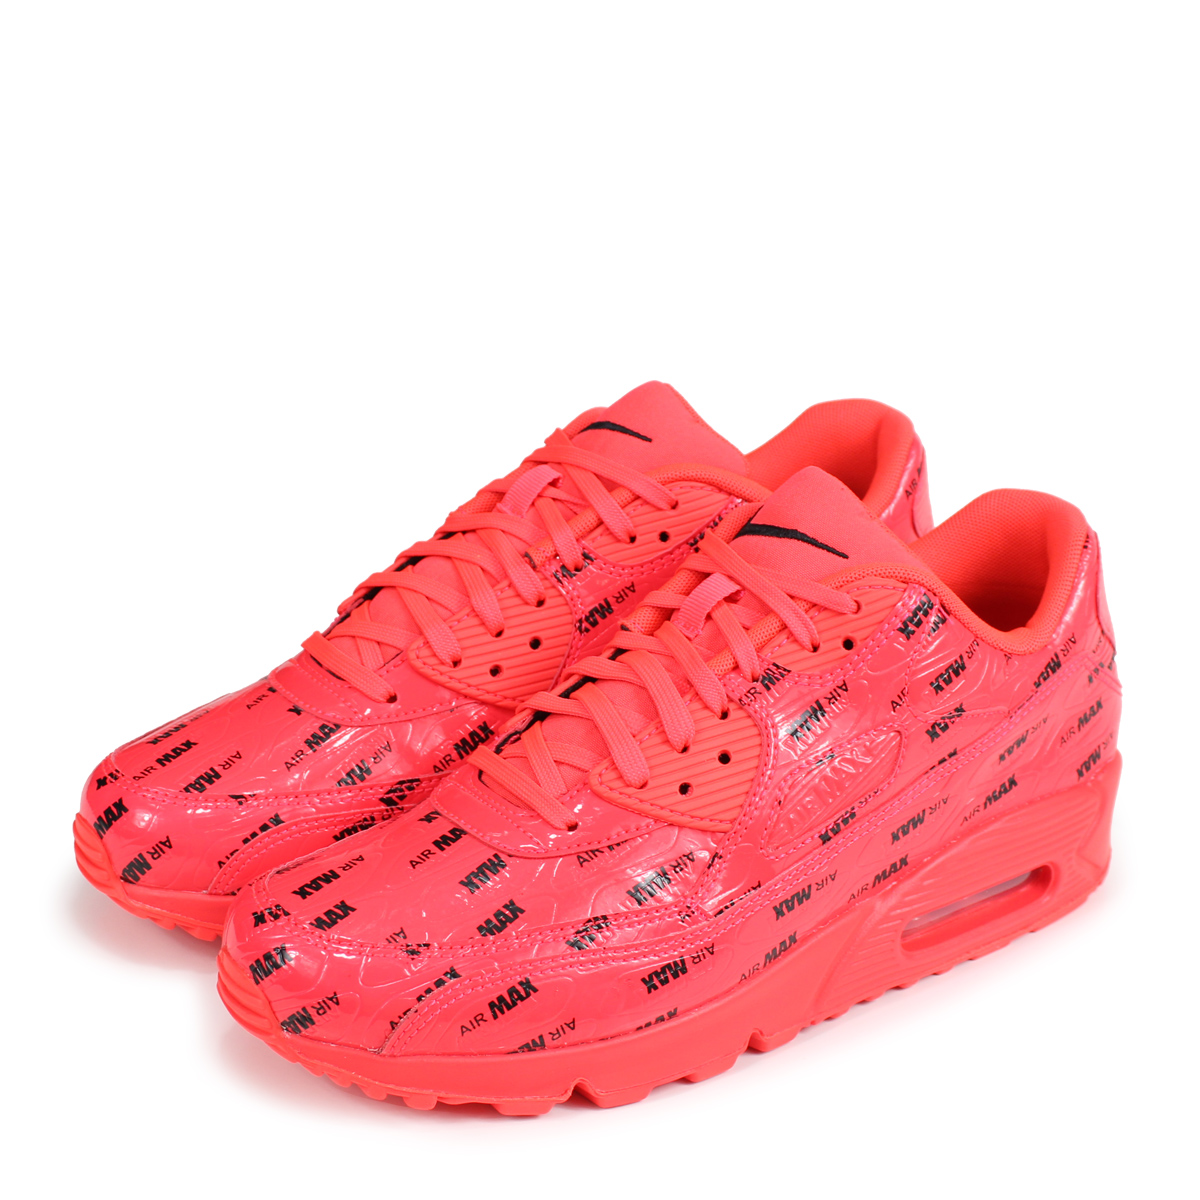 Nike NIKE Air Max 90 sneakers men gap Dis AIR MAX 90 PREMIUM 700,155 604 red red [the 1113 additional arrival]